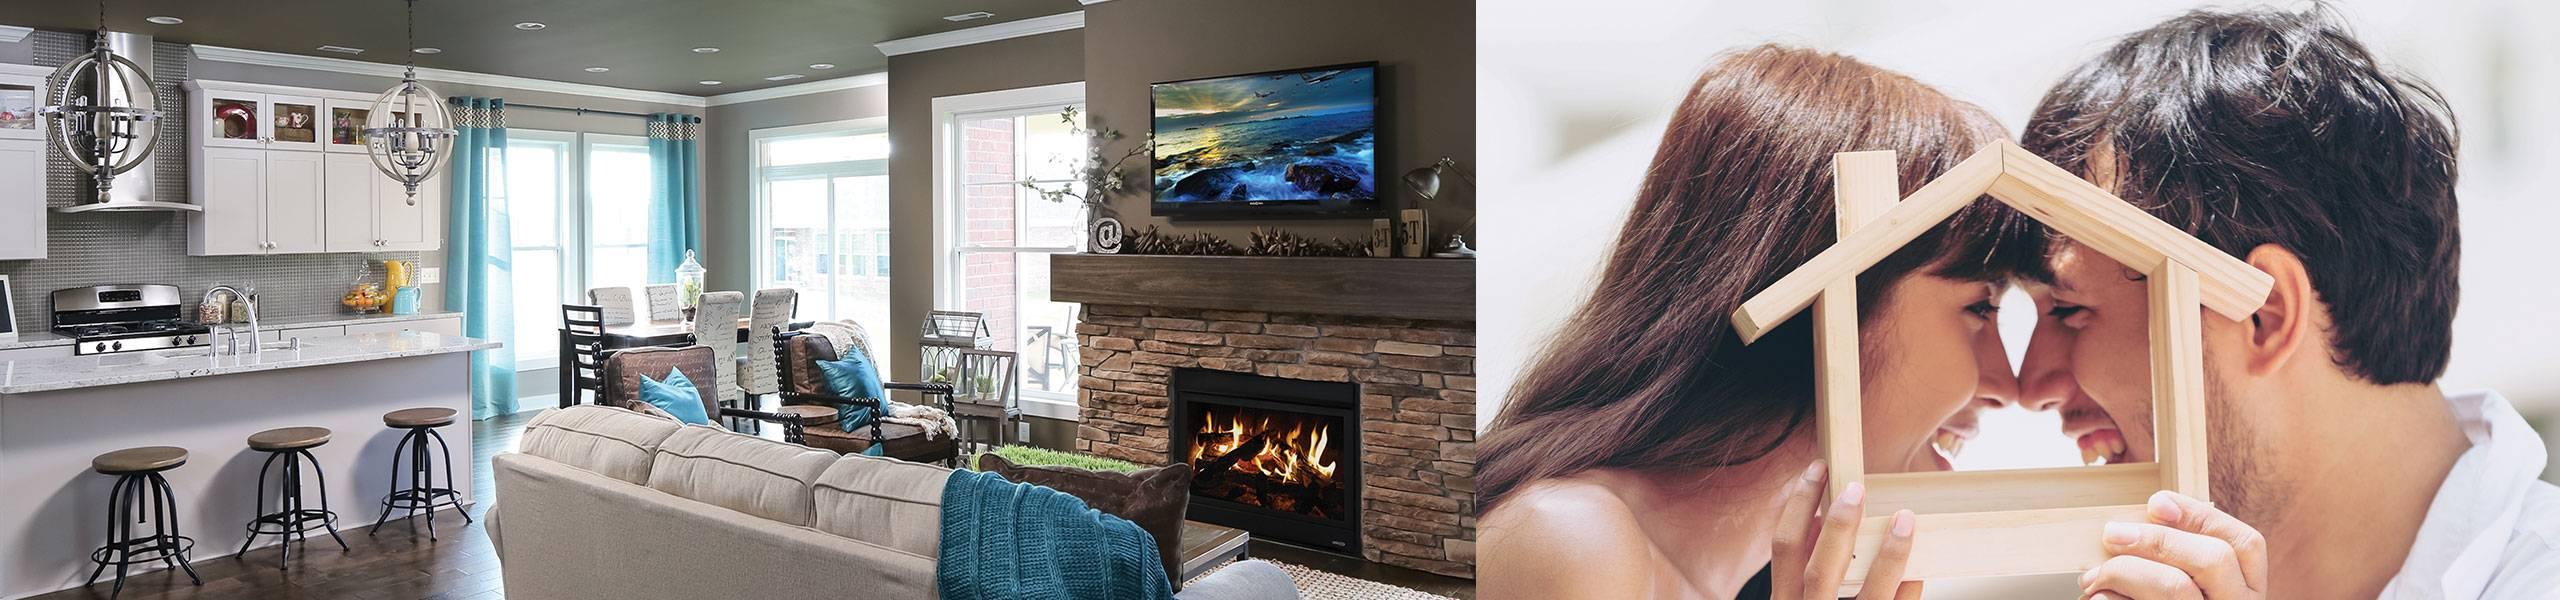 Jagoe Homes Home Buyer Incentives